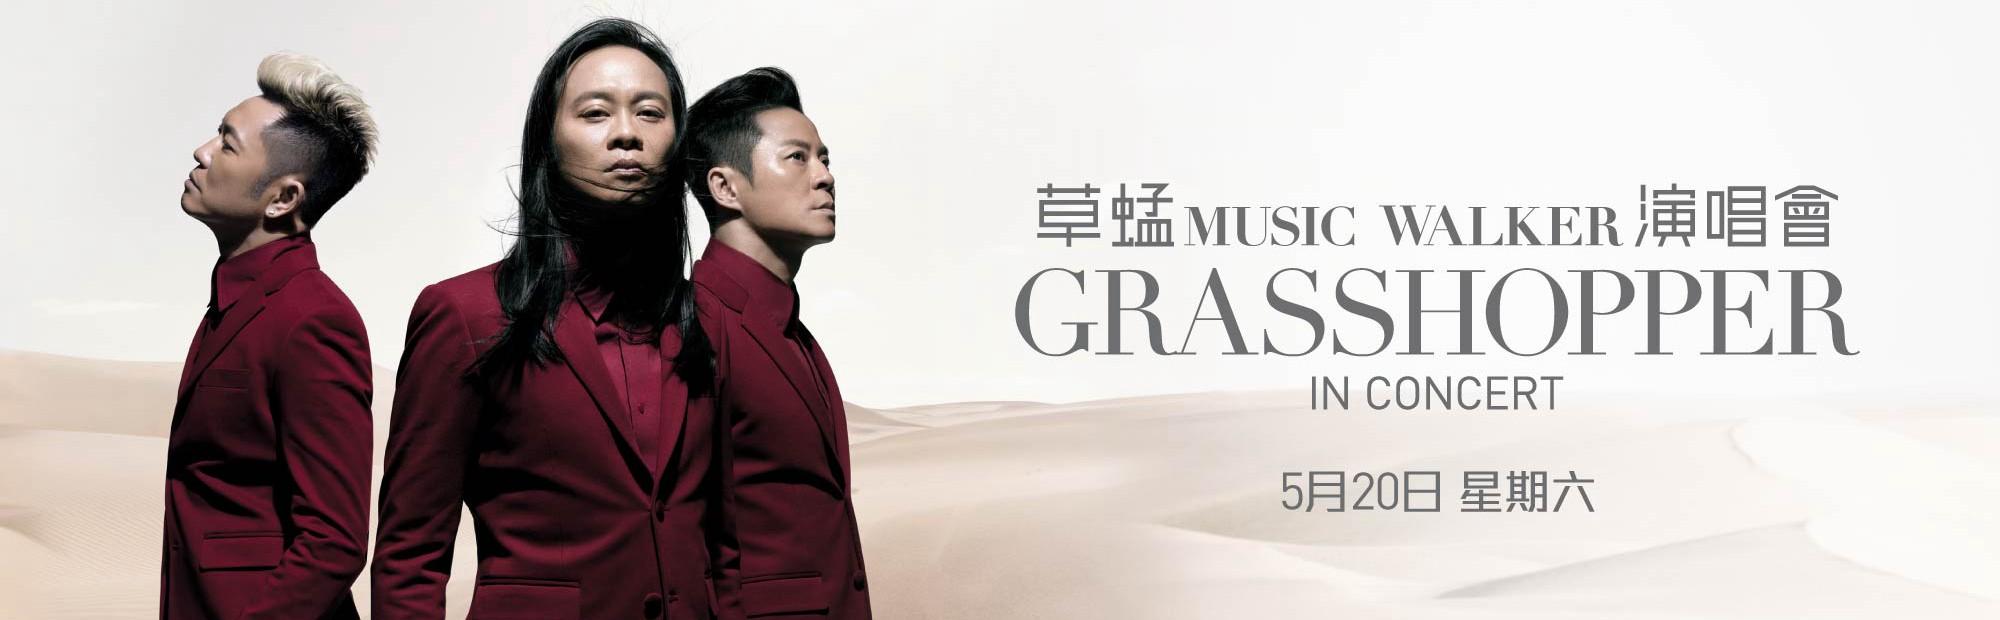 Music Walker 草蜢演唱会-澳门站